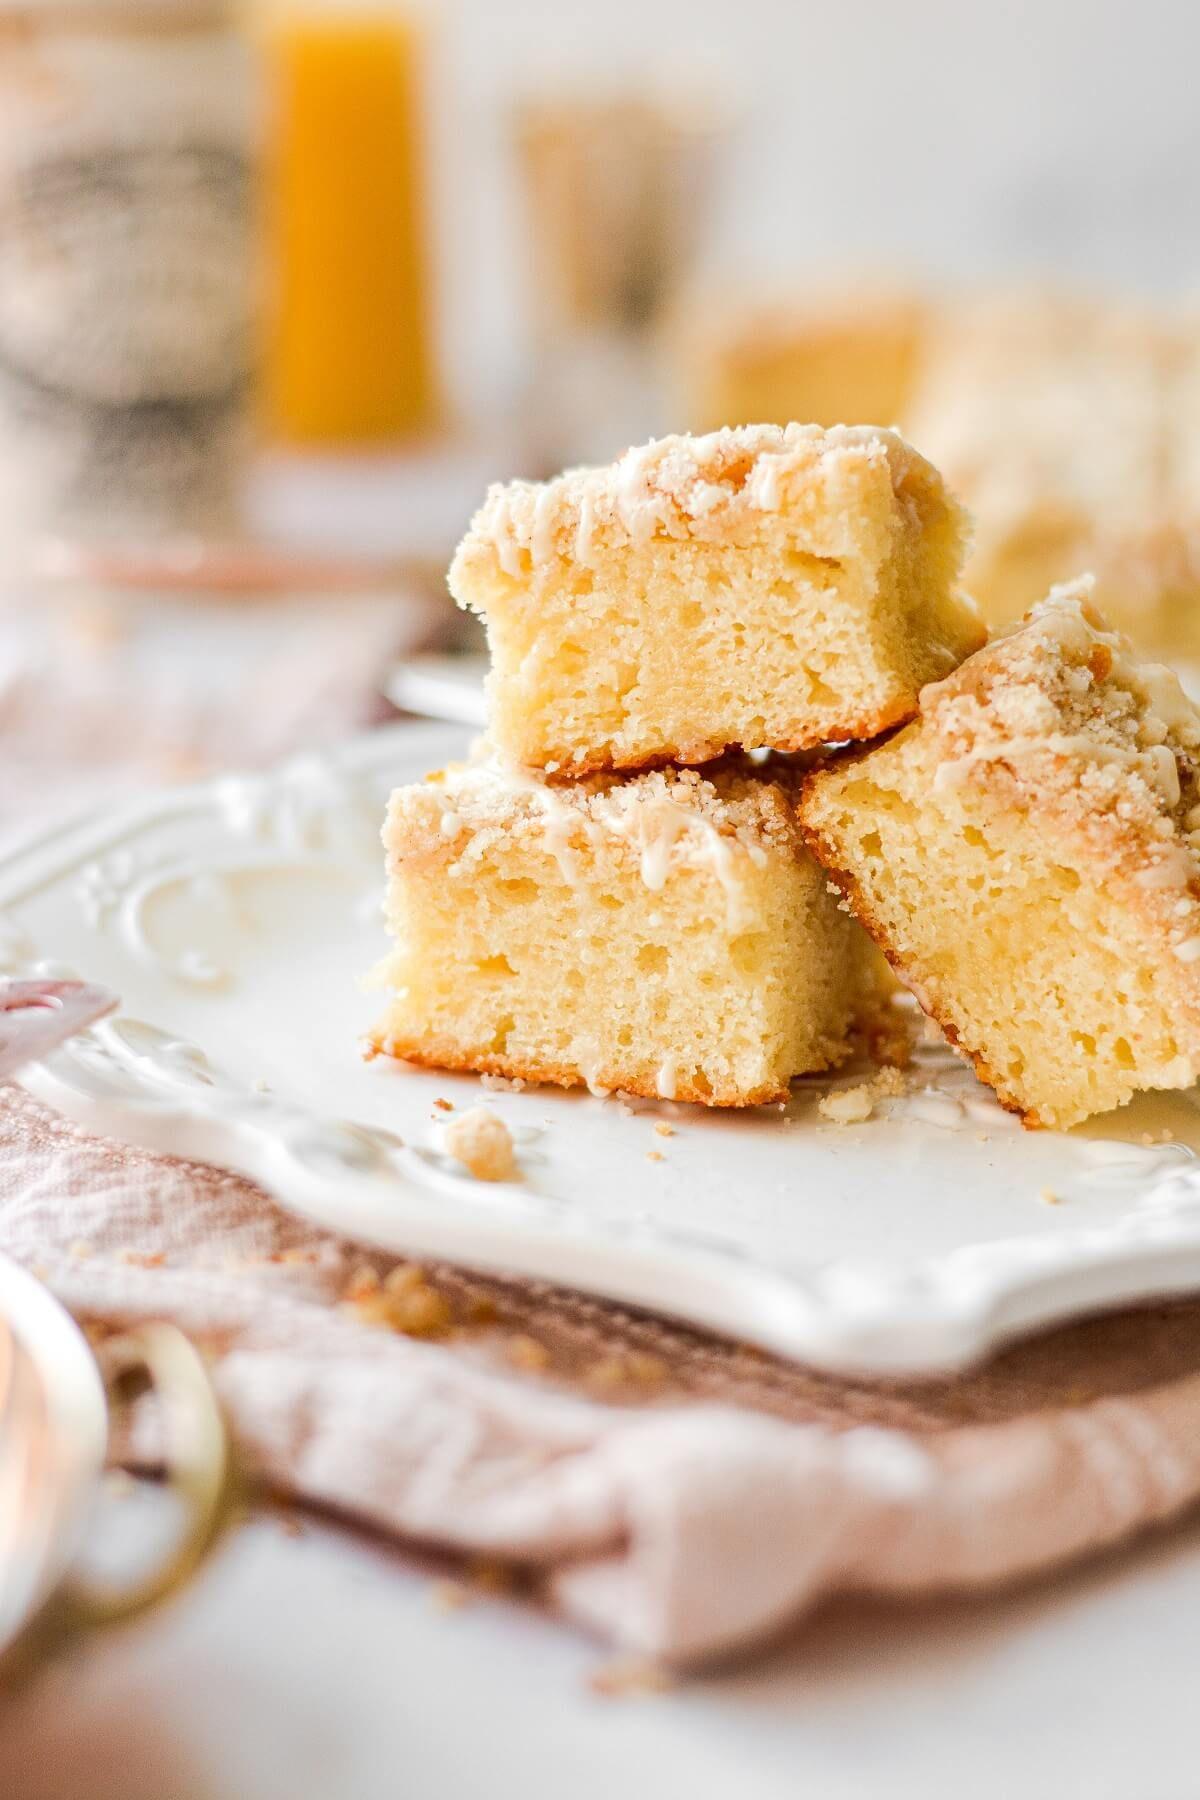 Orange Sour Cream Coffee Cake Curly Girl Kitchen Recipe In 2020 Coffee Cake Sour Cream Coffee Cake Sour Cream